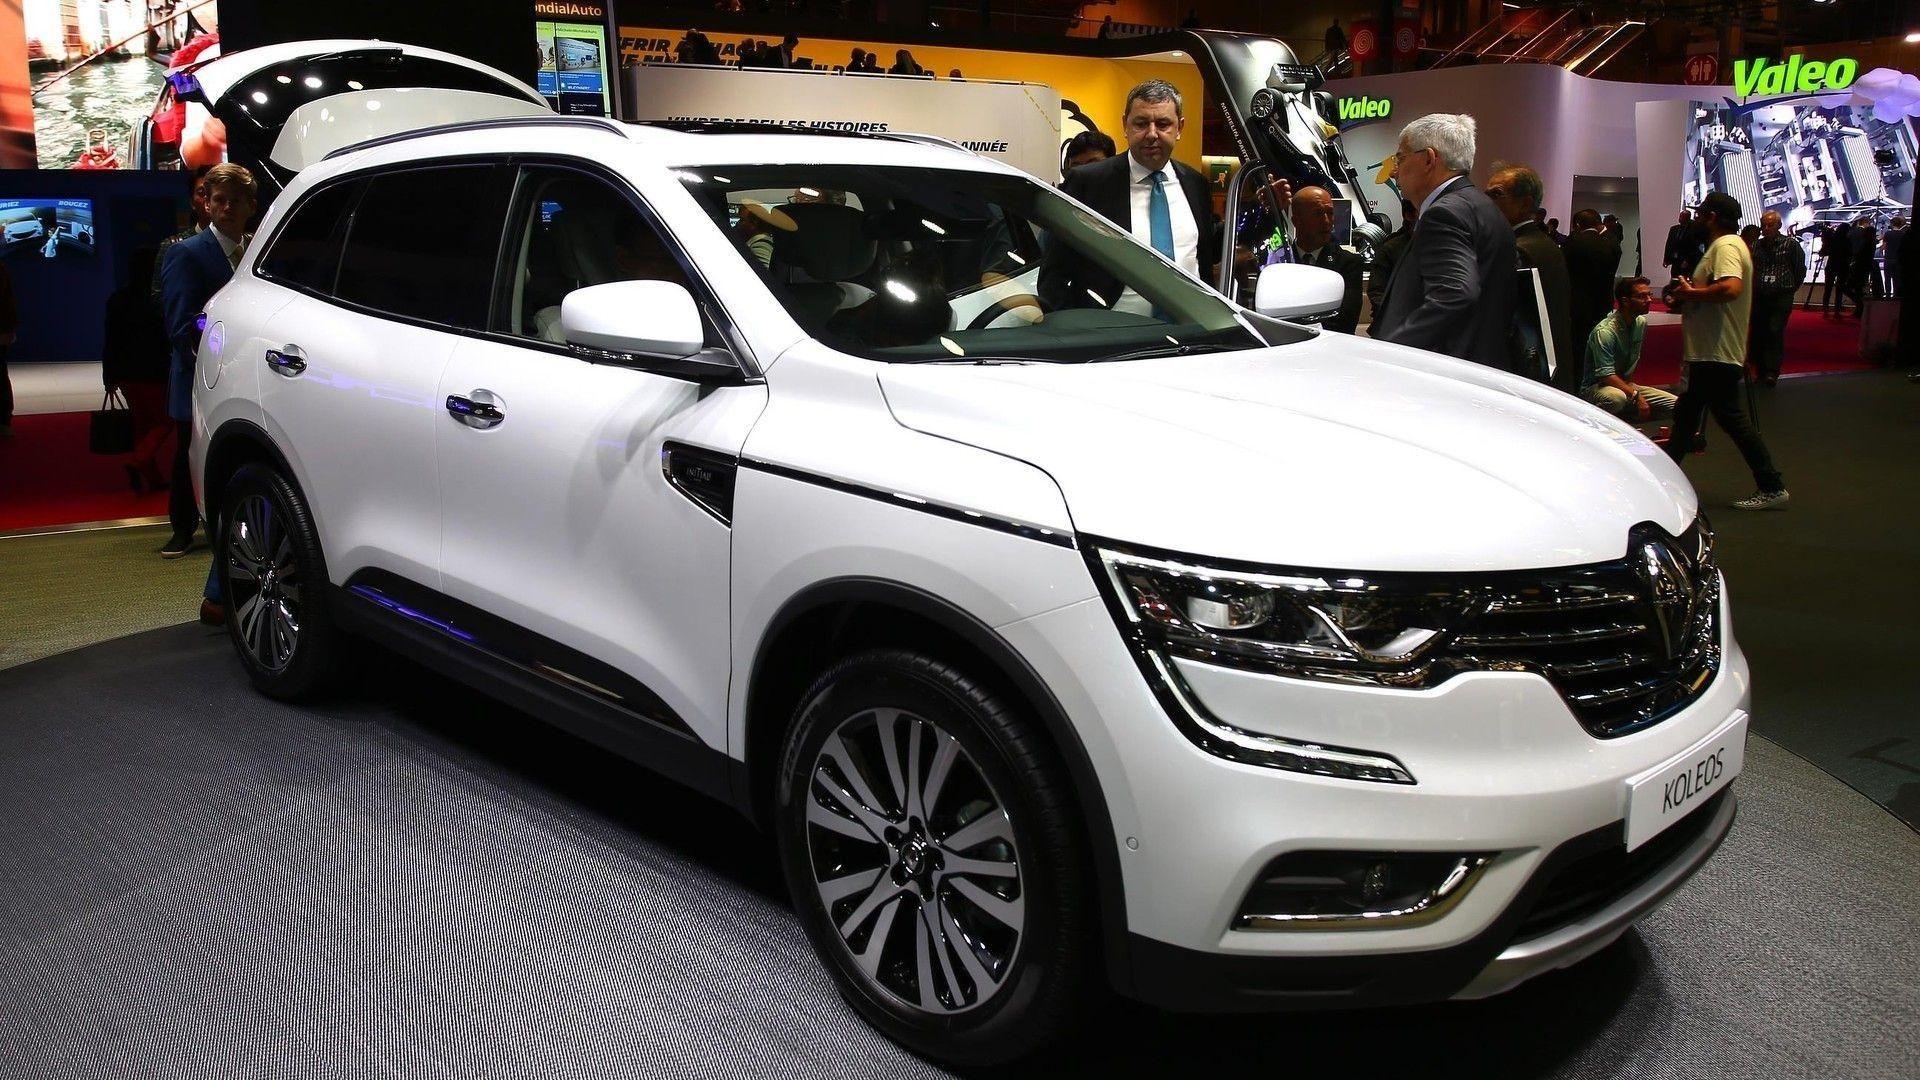 2019 Renault Megane Suv Review Car Review Car Review